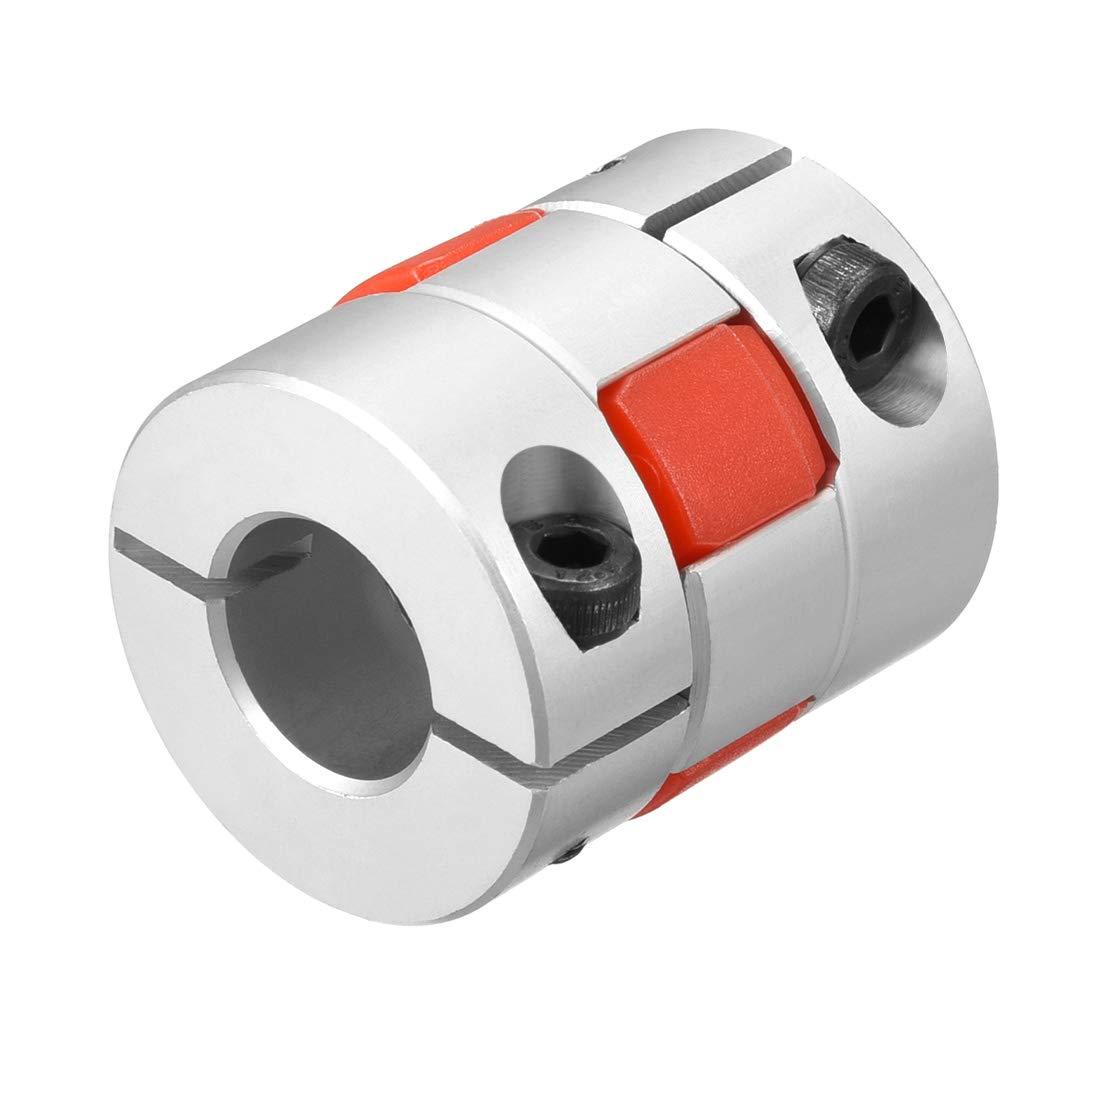 Sourcingmap Acoplamiento de eje de 12 mm a 15 mm de di/ámetro para motor paso a paso Servo L35xD30